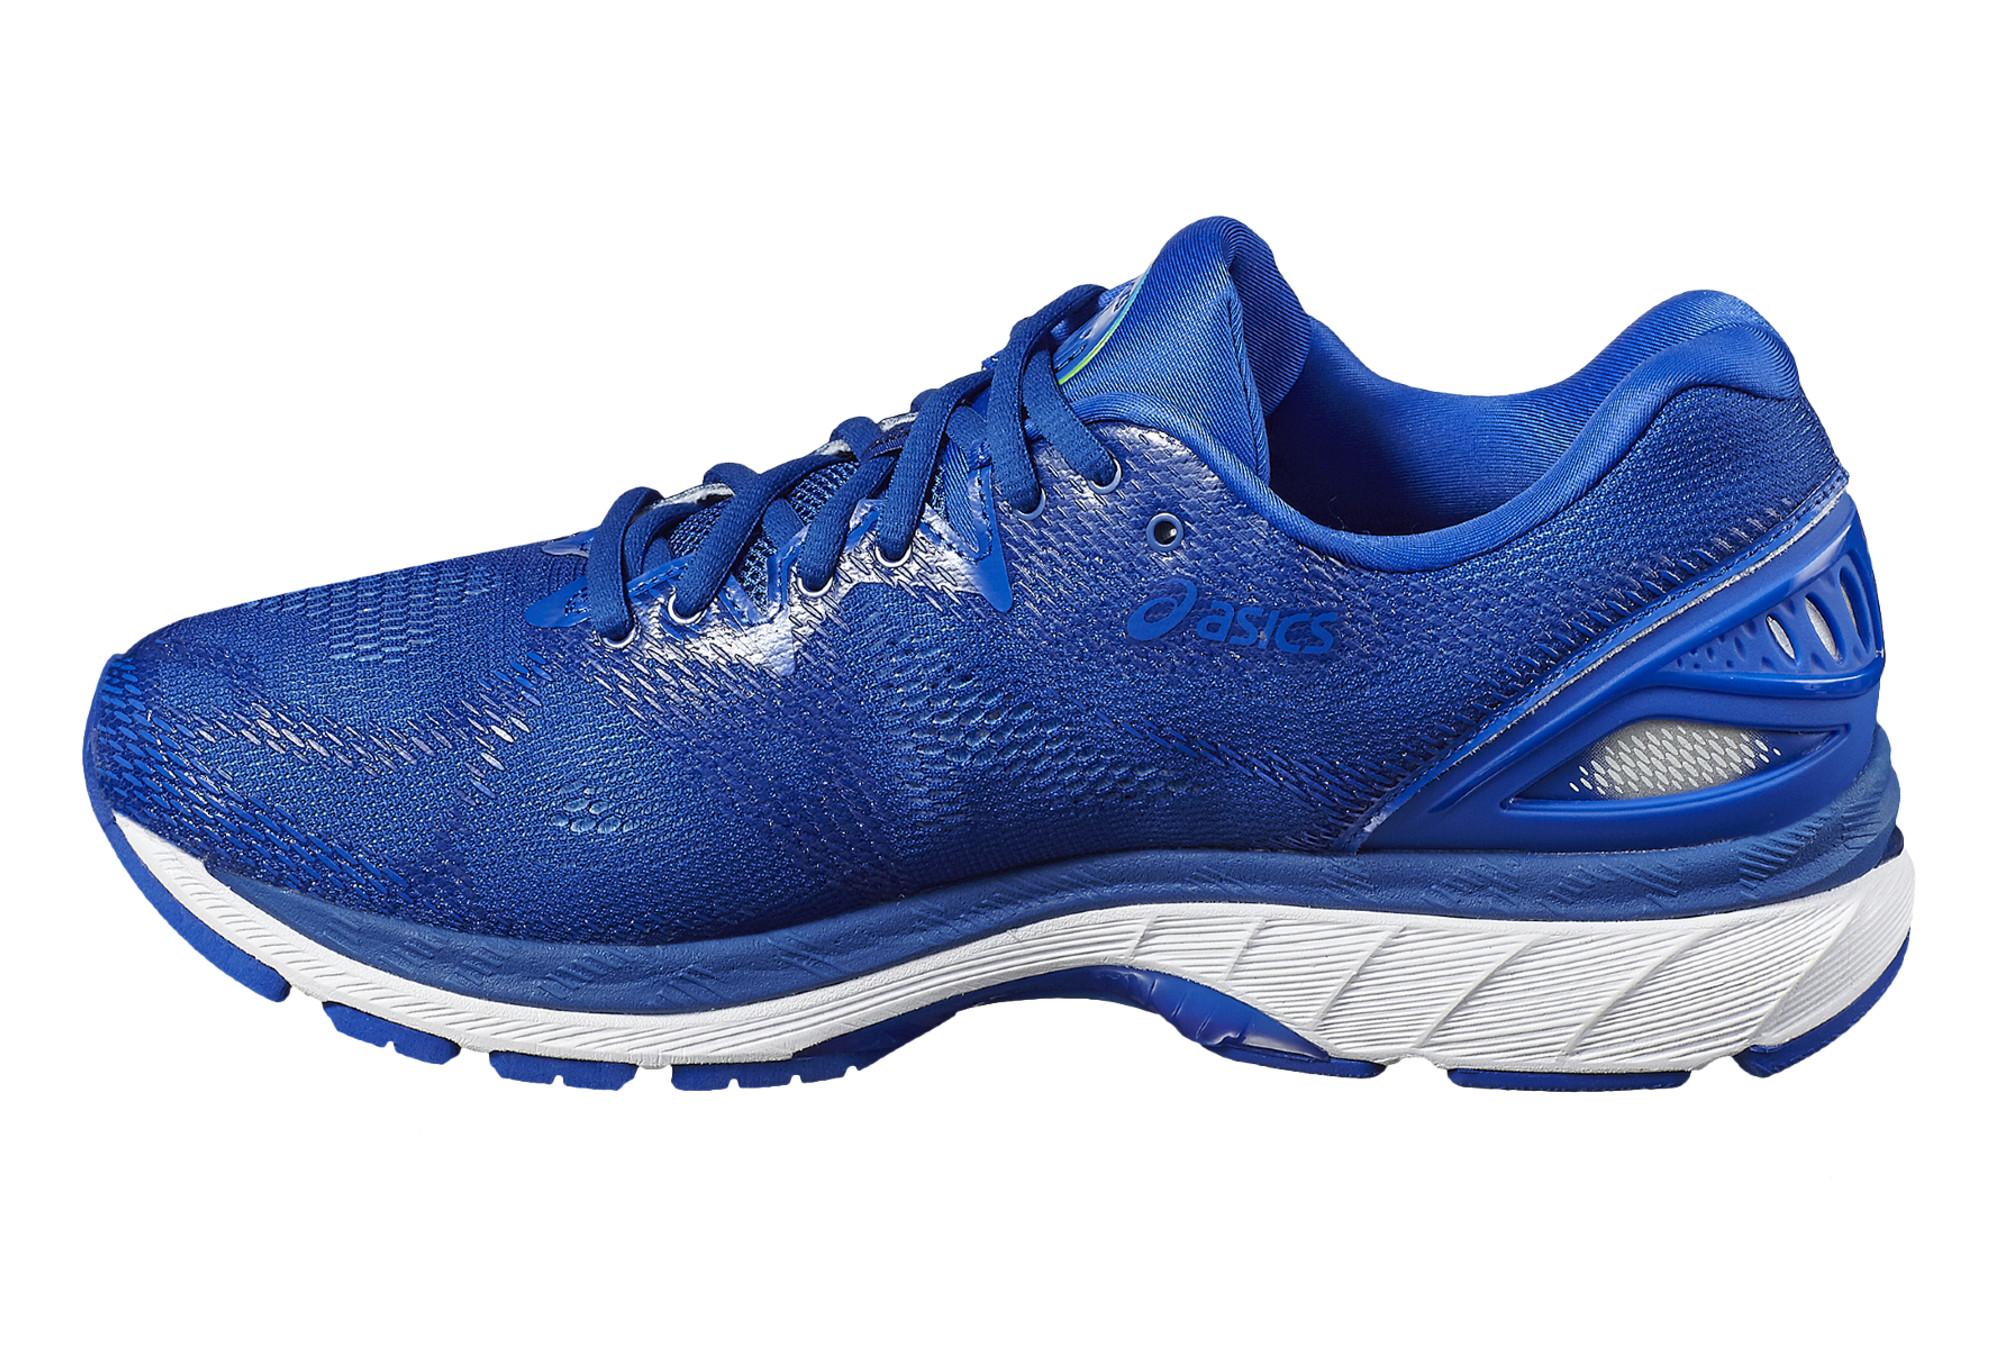 Asics Chaussures Marathon Running 20 Gel Nimbus Blanc Paris De ERWrxqHgR